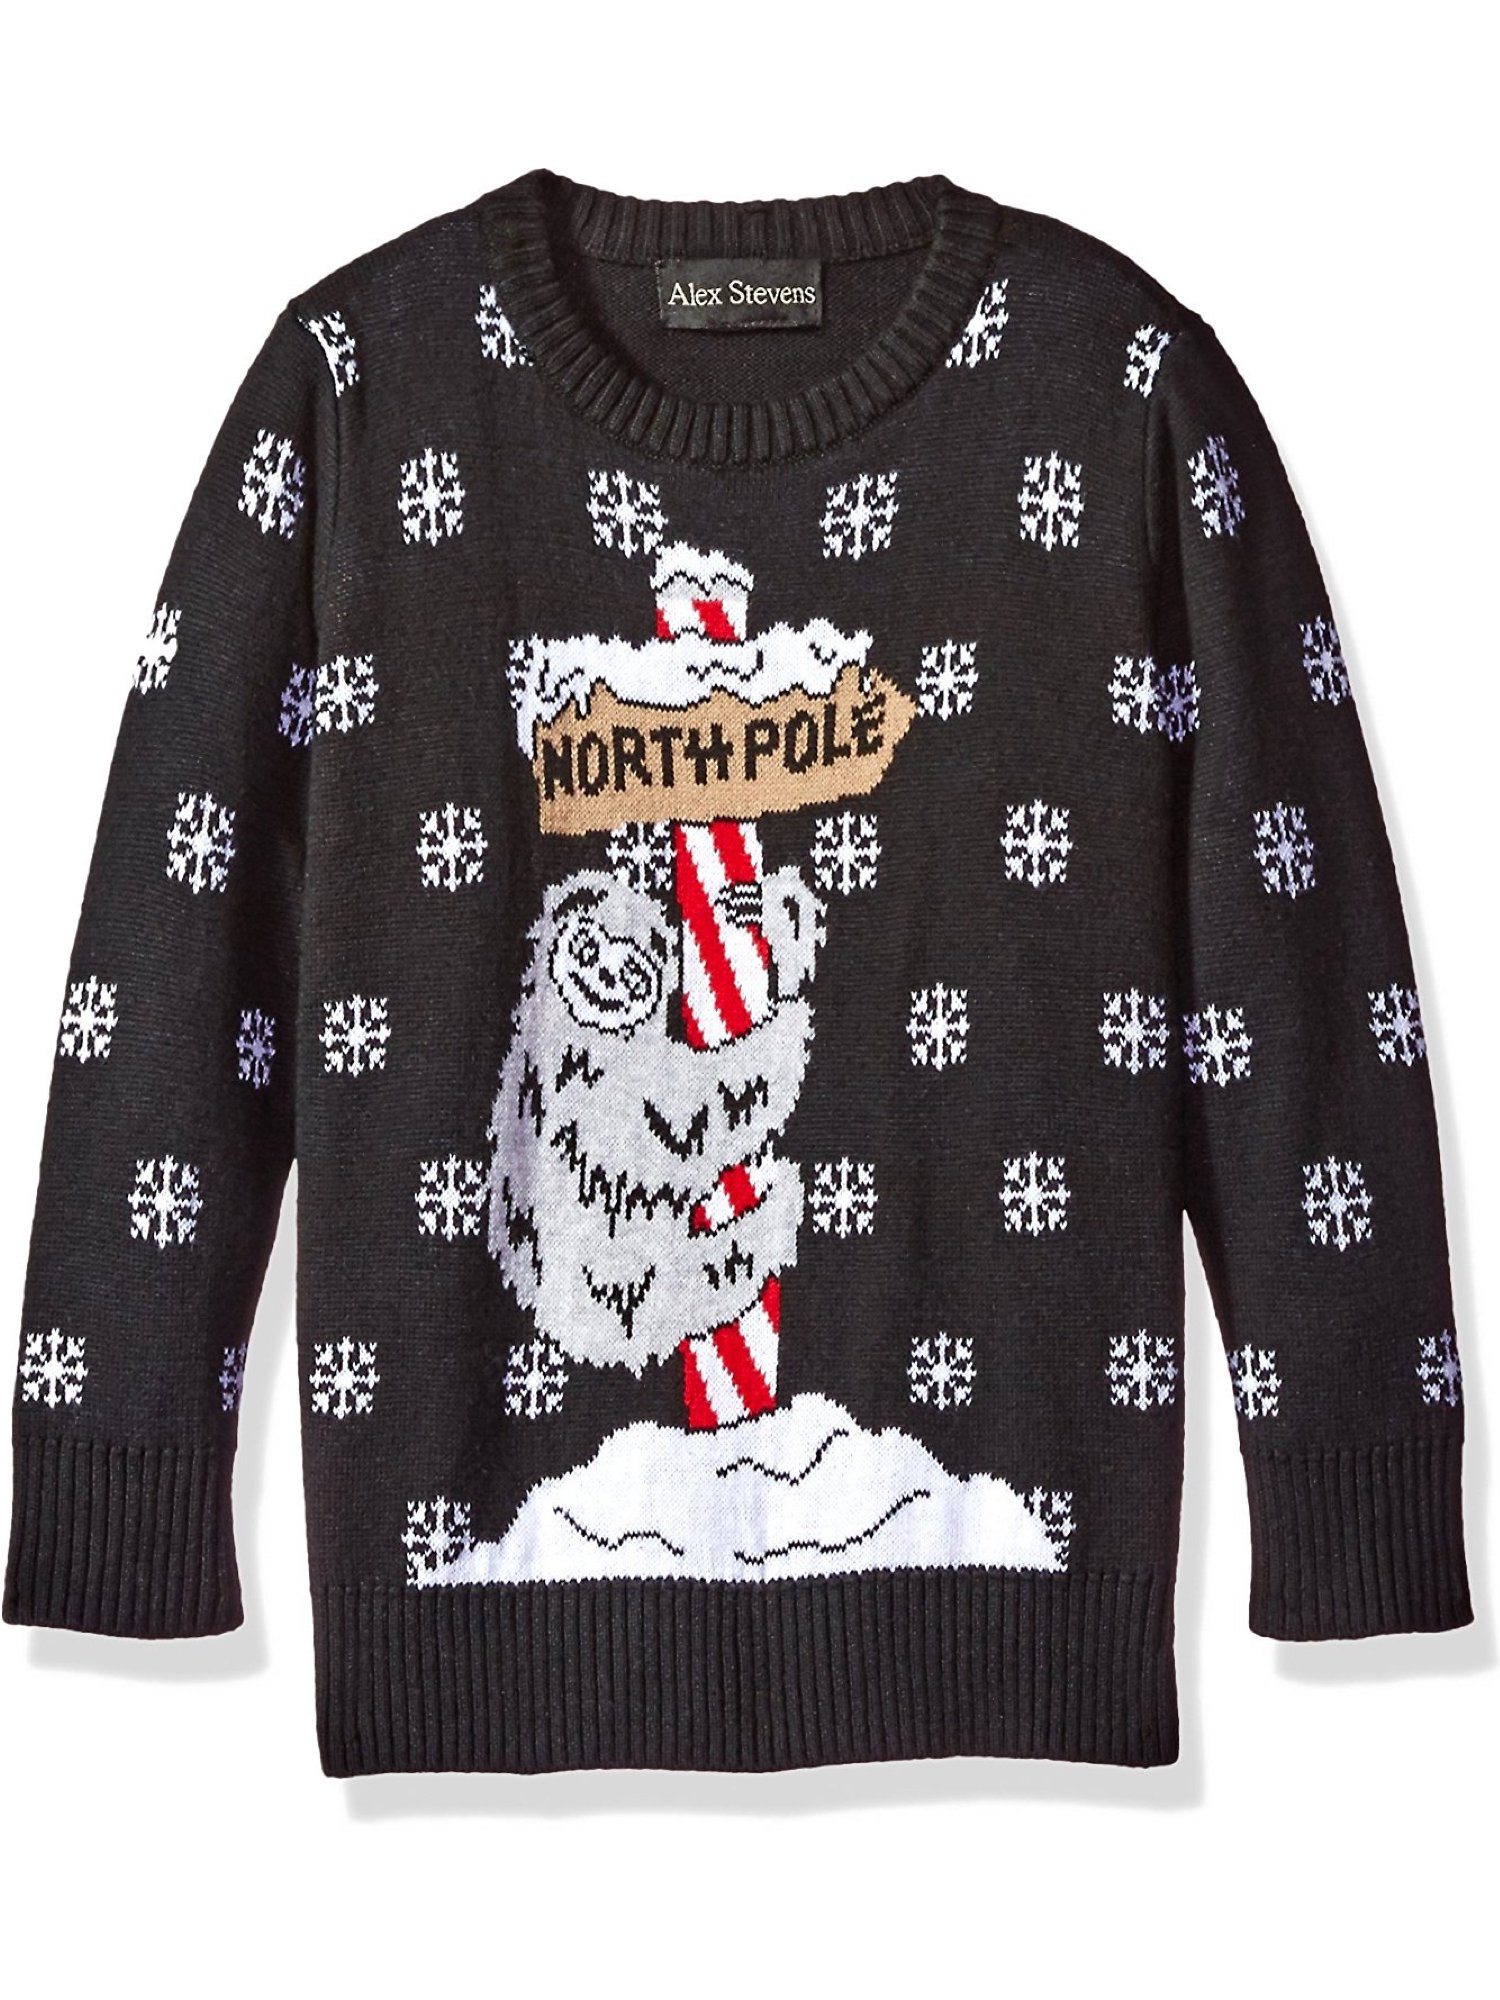 Alex Stevens Boys' Sloth Pole Sweater